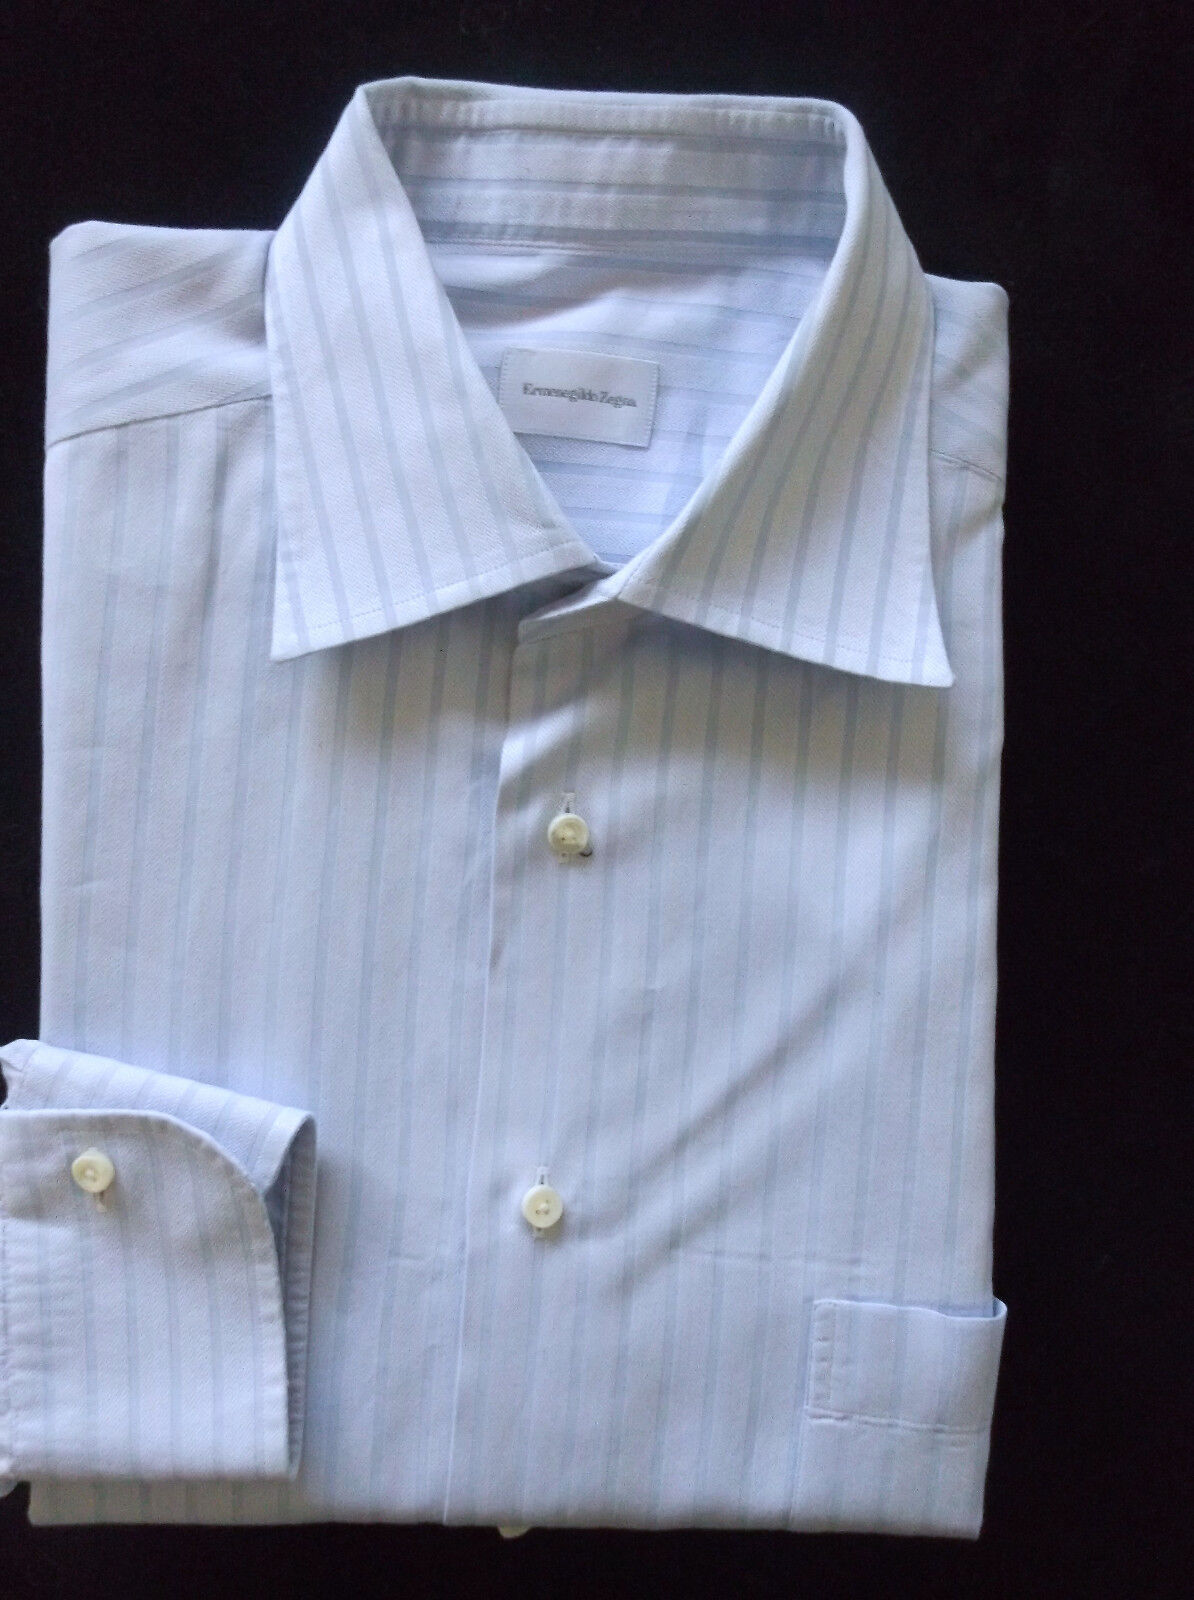 Ermenegildo Zegna Blau with light Blau Striped Spread Collar Shirt Sz 16 1/2 43